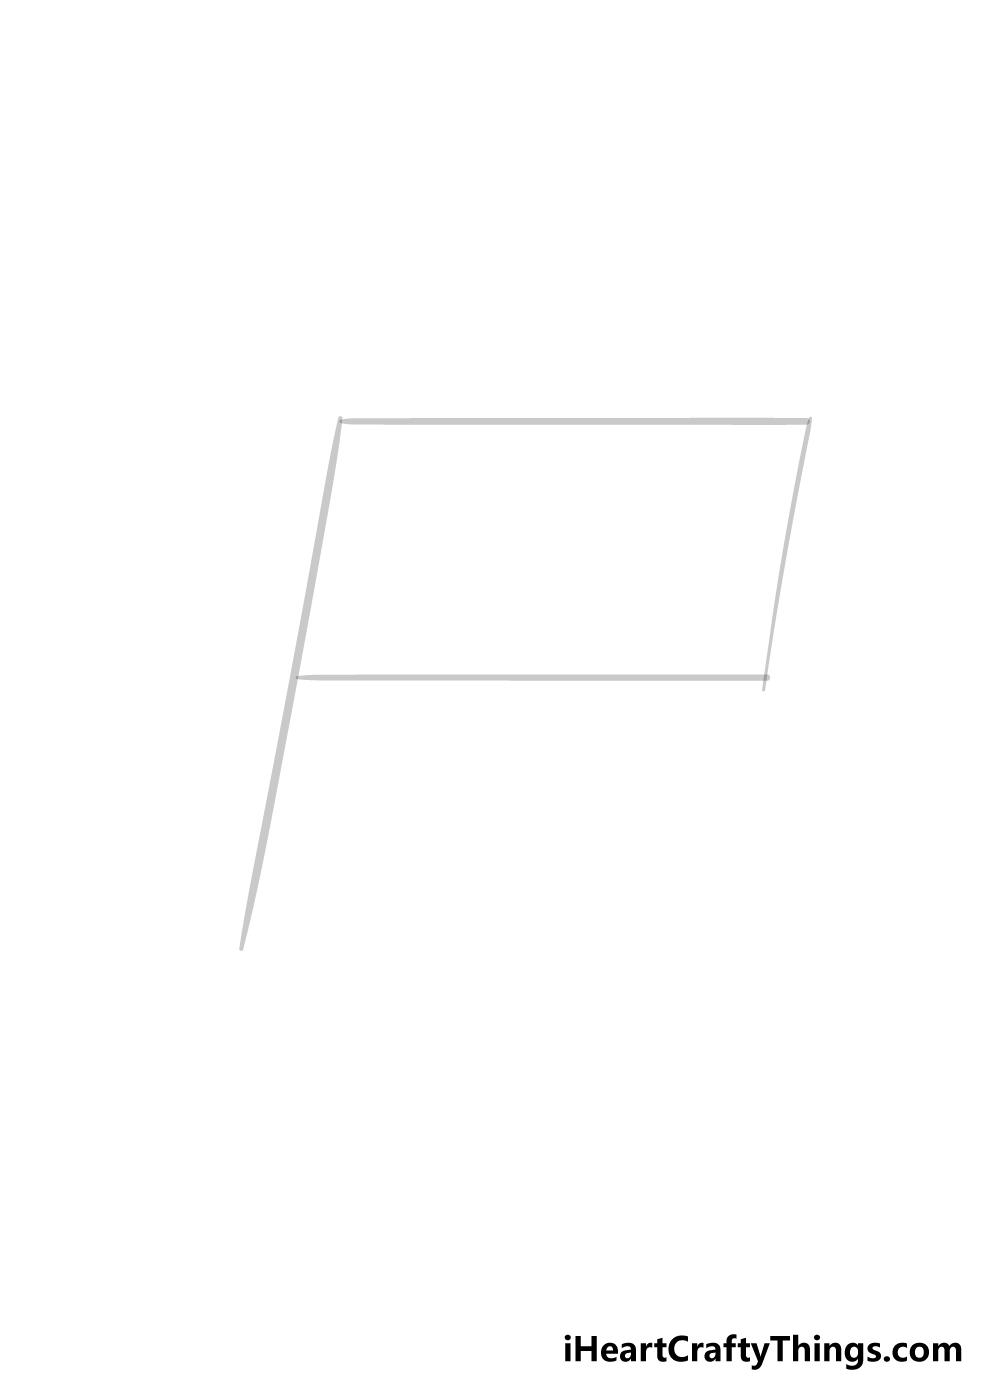 flag drawing step 1